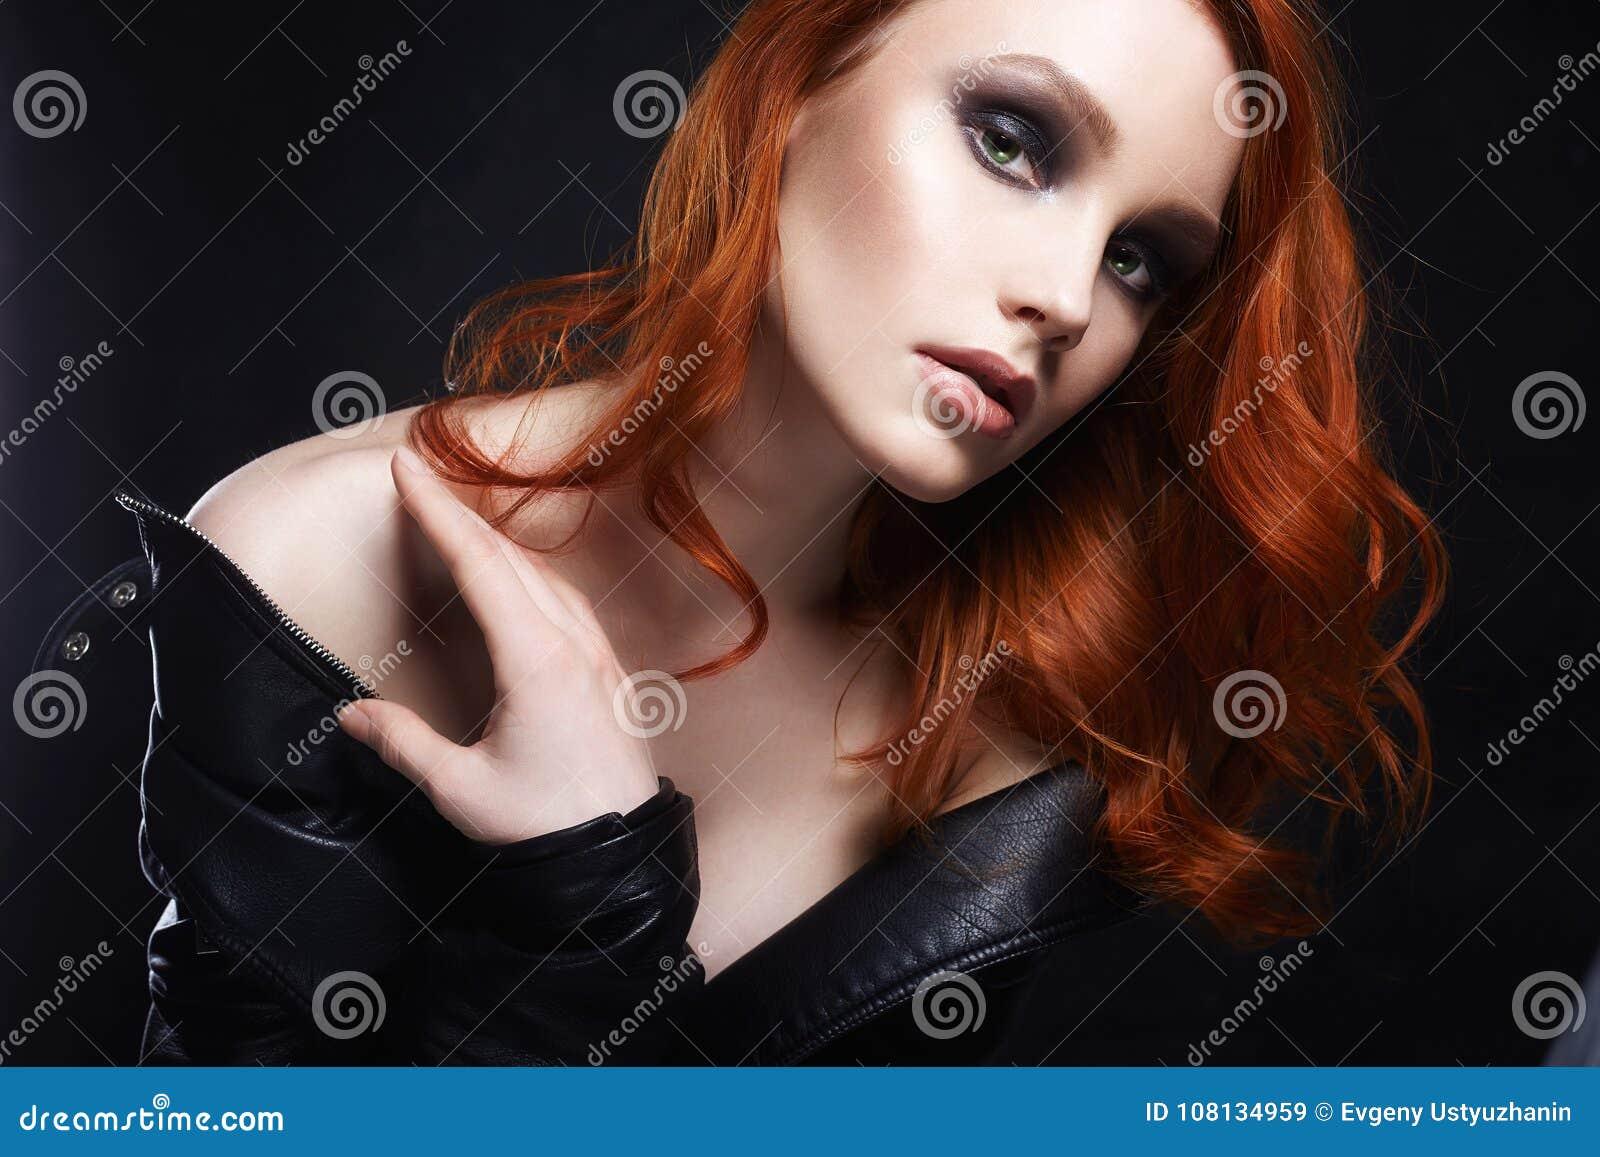 Sexy gingembre fillesmaquillage pour les @todorazor.com